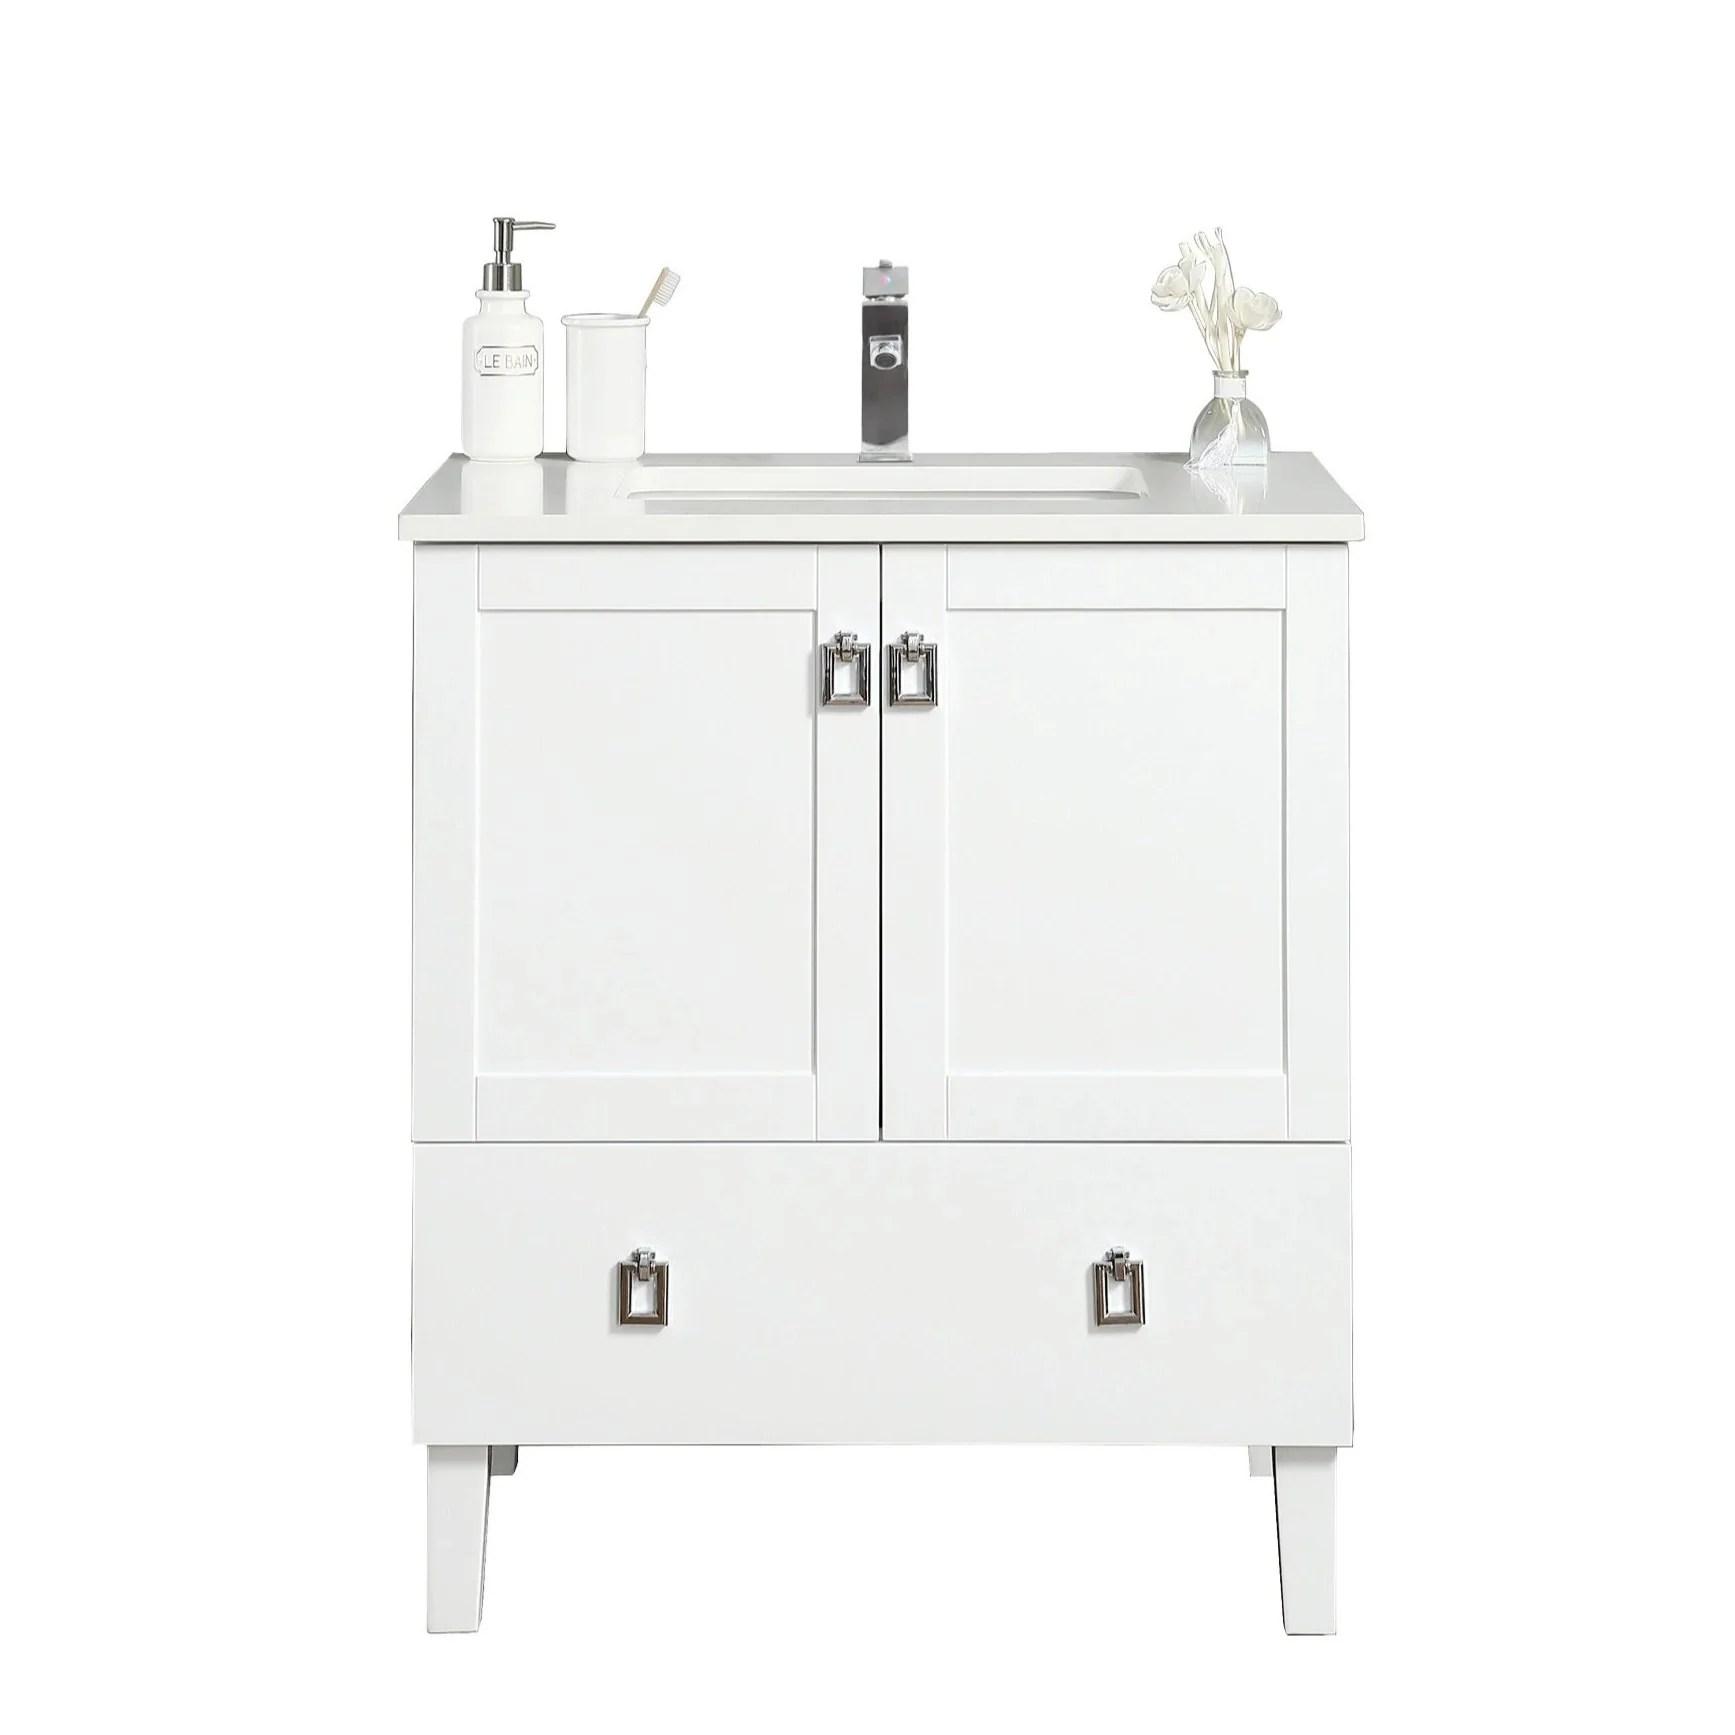 Tessa Bathroom Vanity In Toga White 30 Inch Broadway Vanities